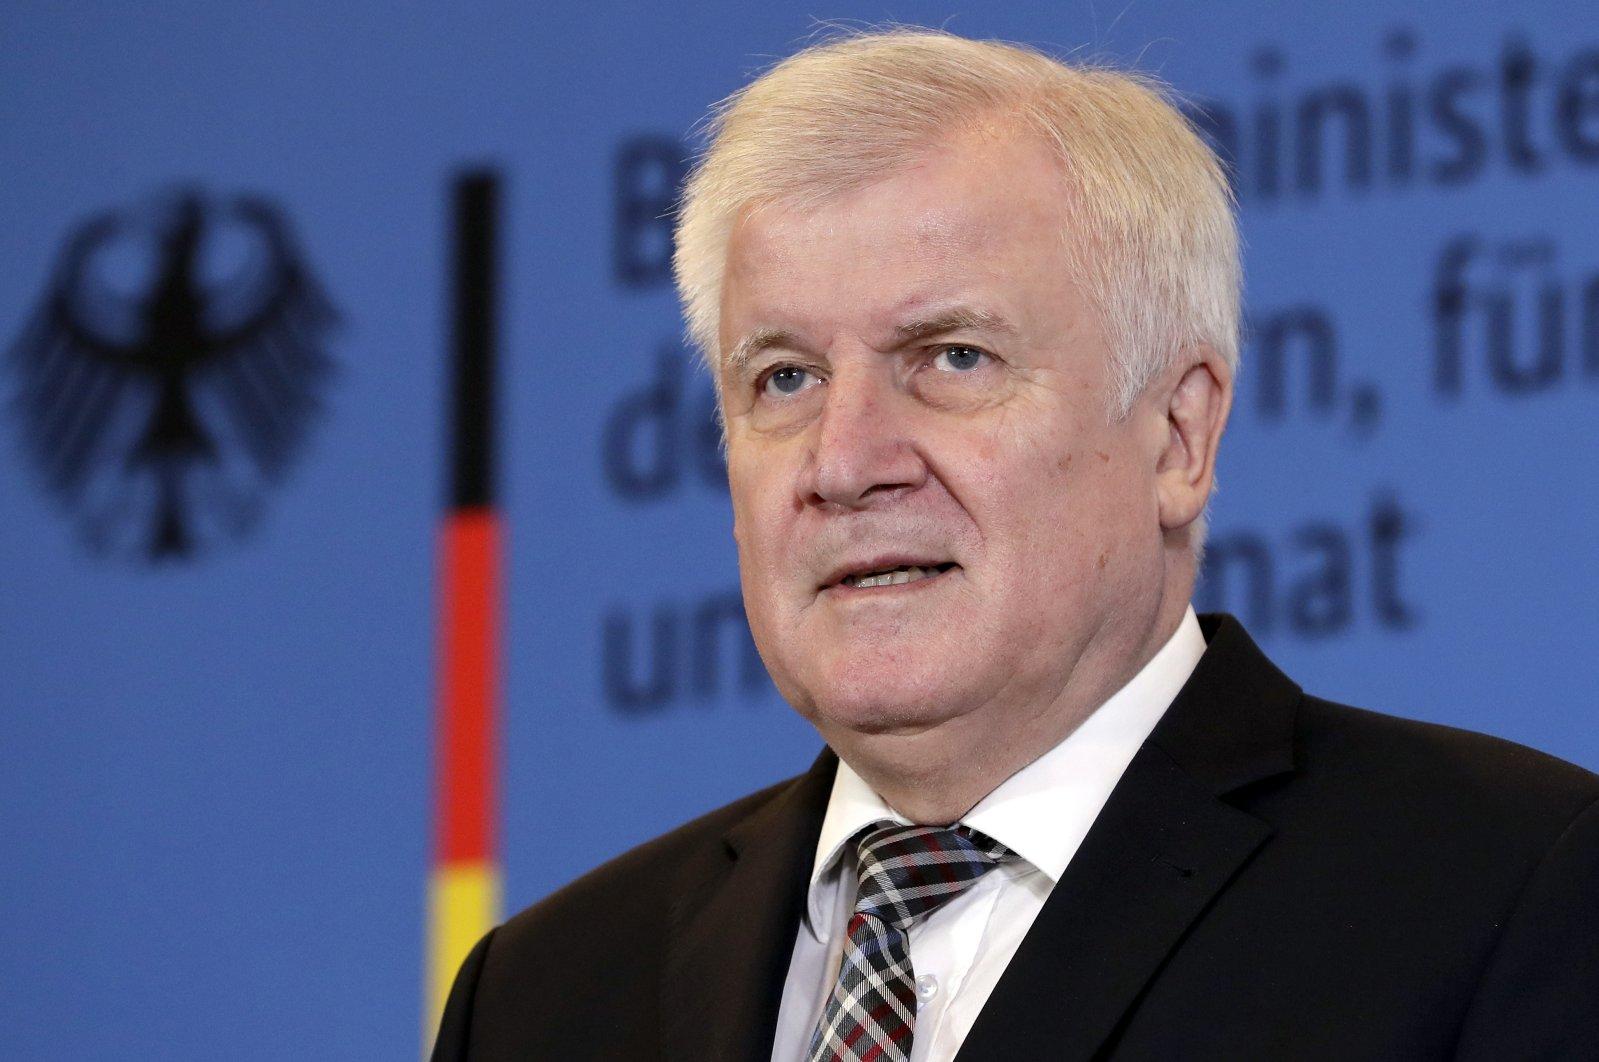 German Interior Minister Horst Seehofer addresses the media during a press conference, Berlin, Nov. 5, 2018. (AP Photo)